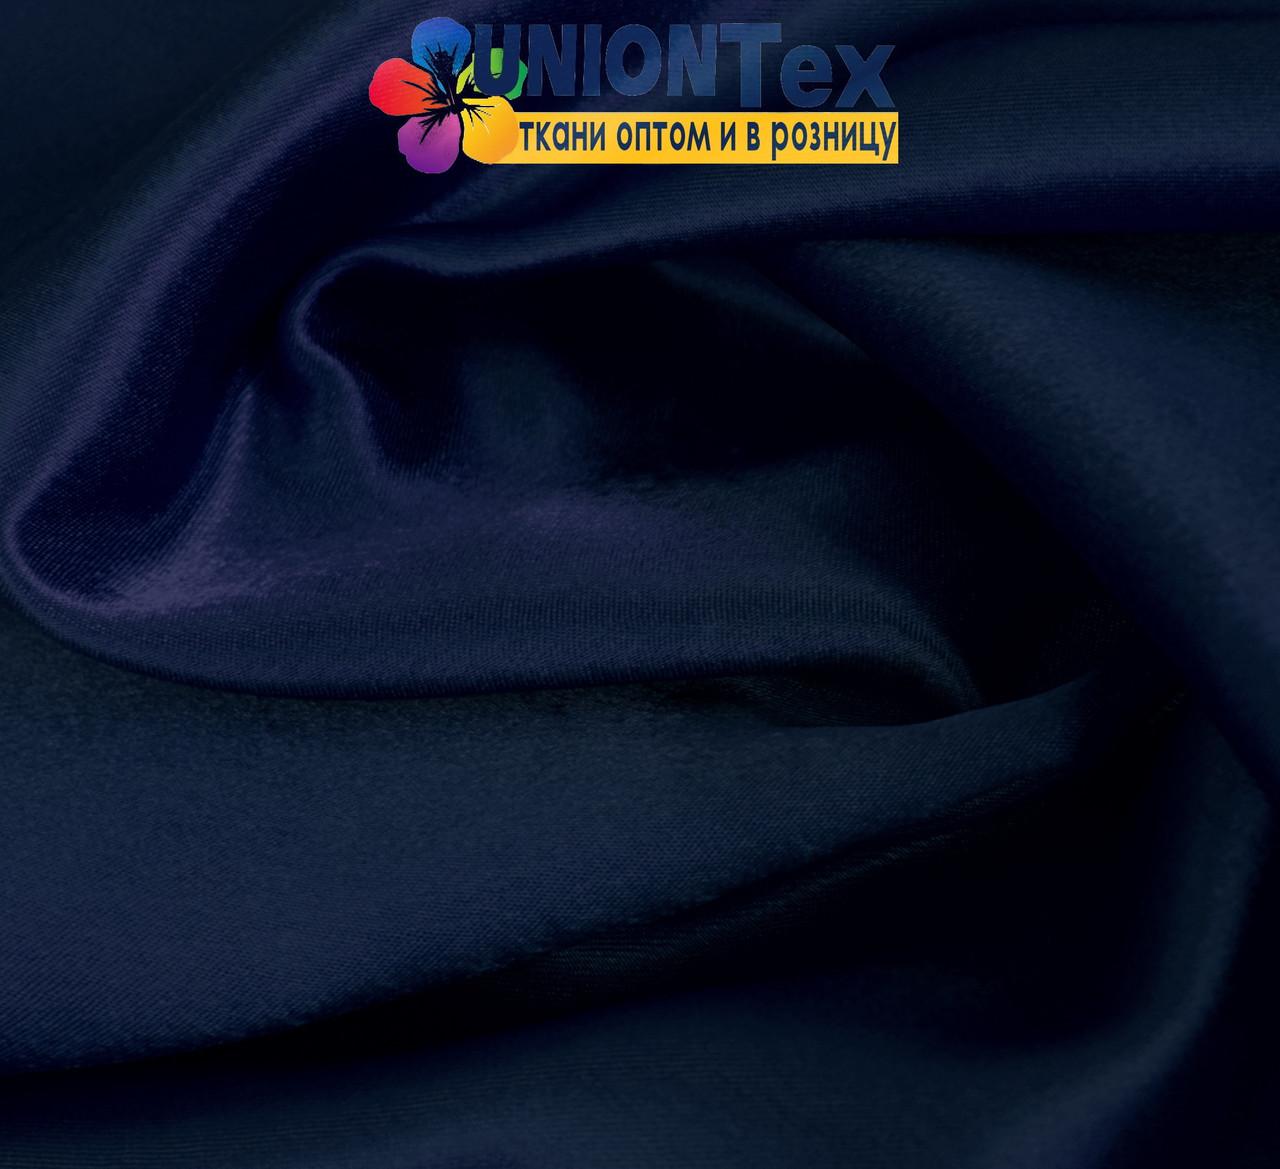 Креп-сатин темно-синий